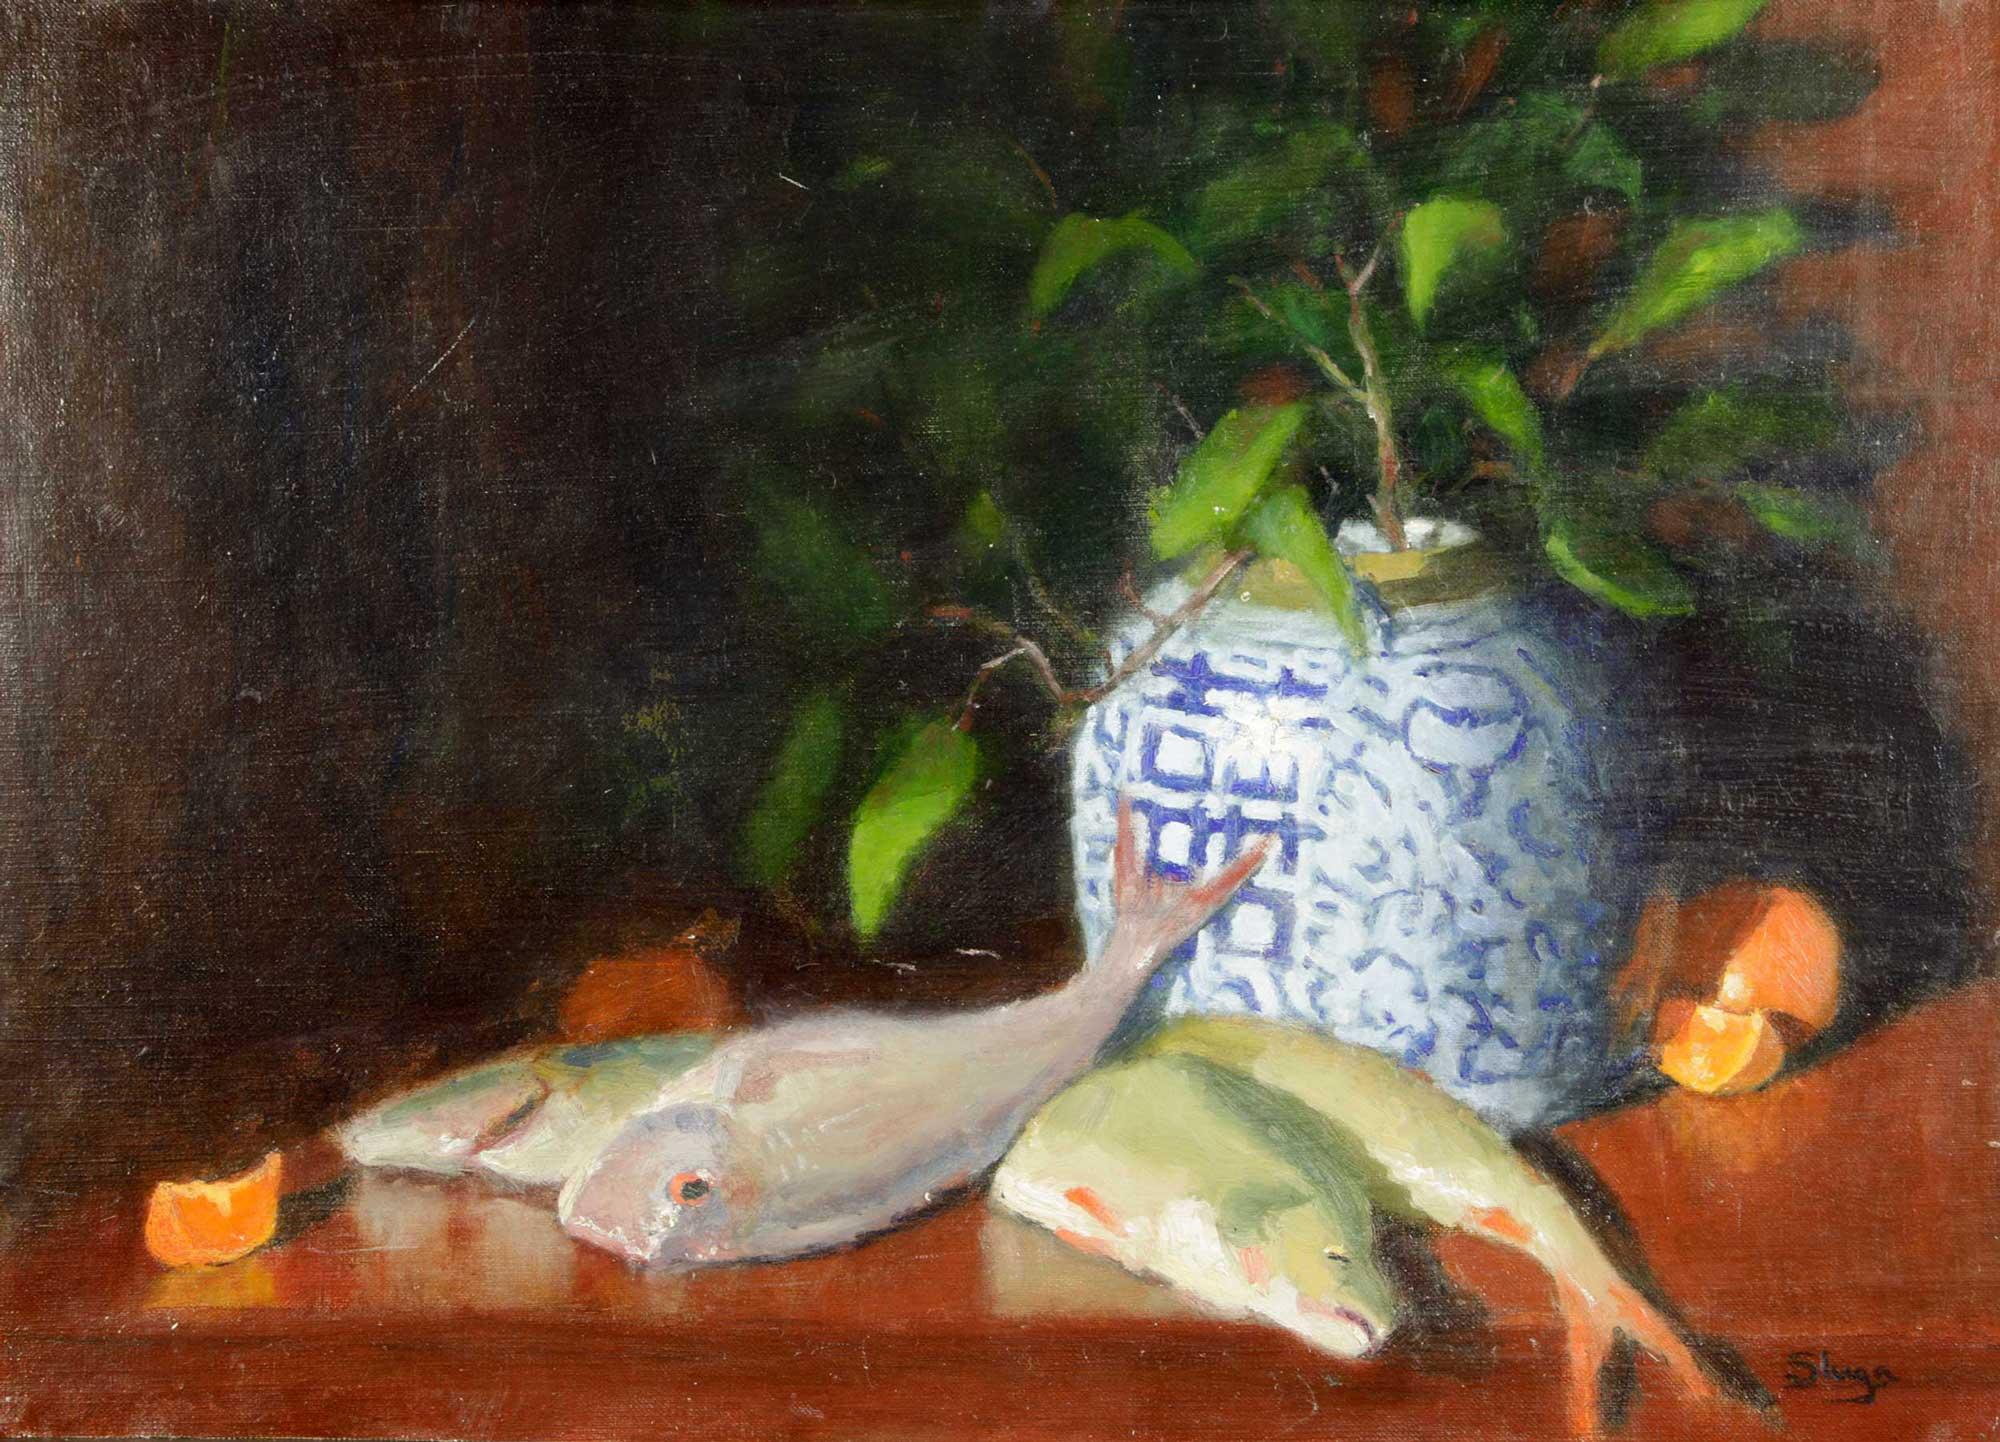 Still Life with Fish  74 x 53 cm